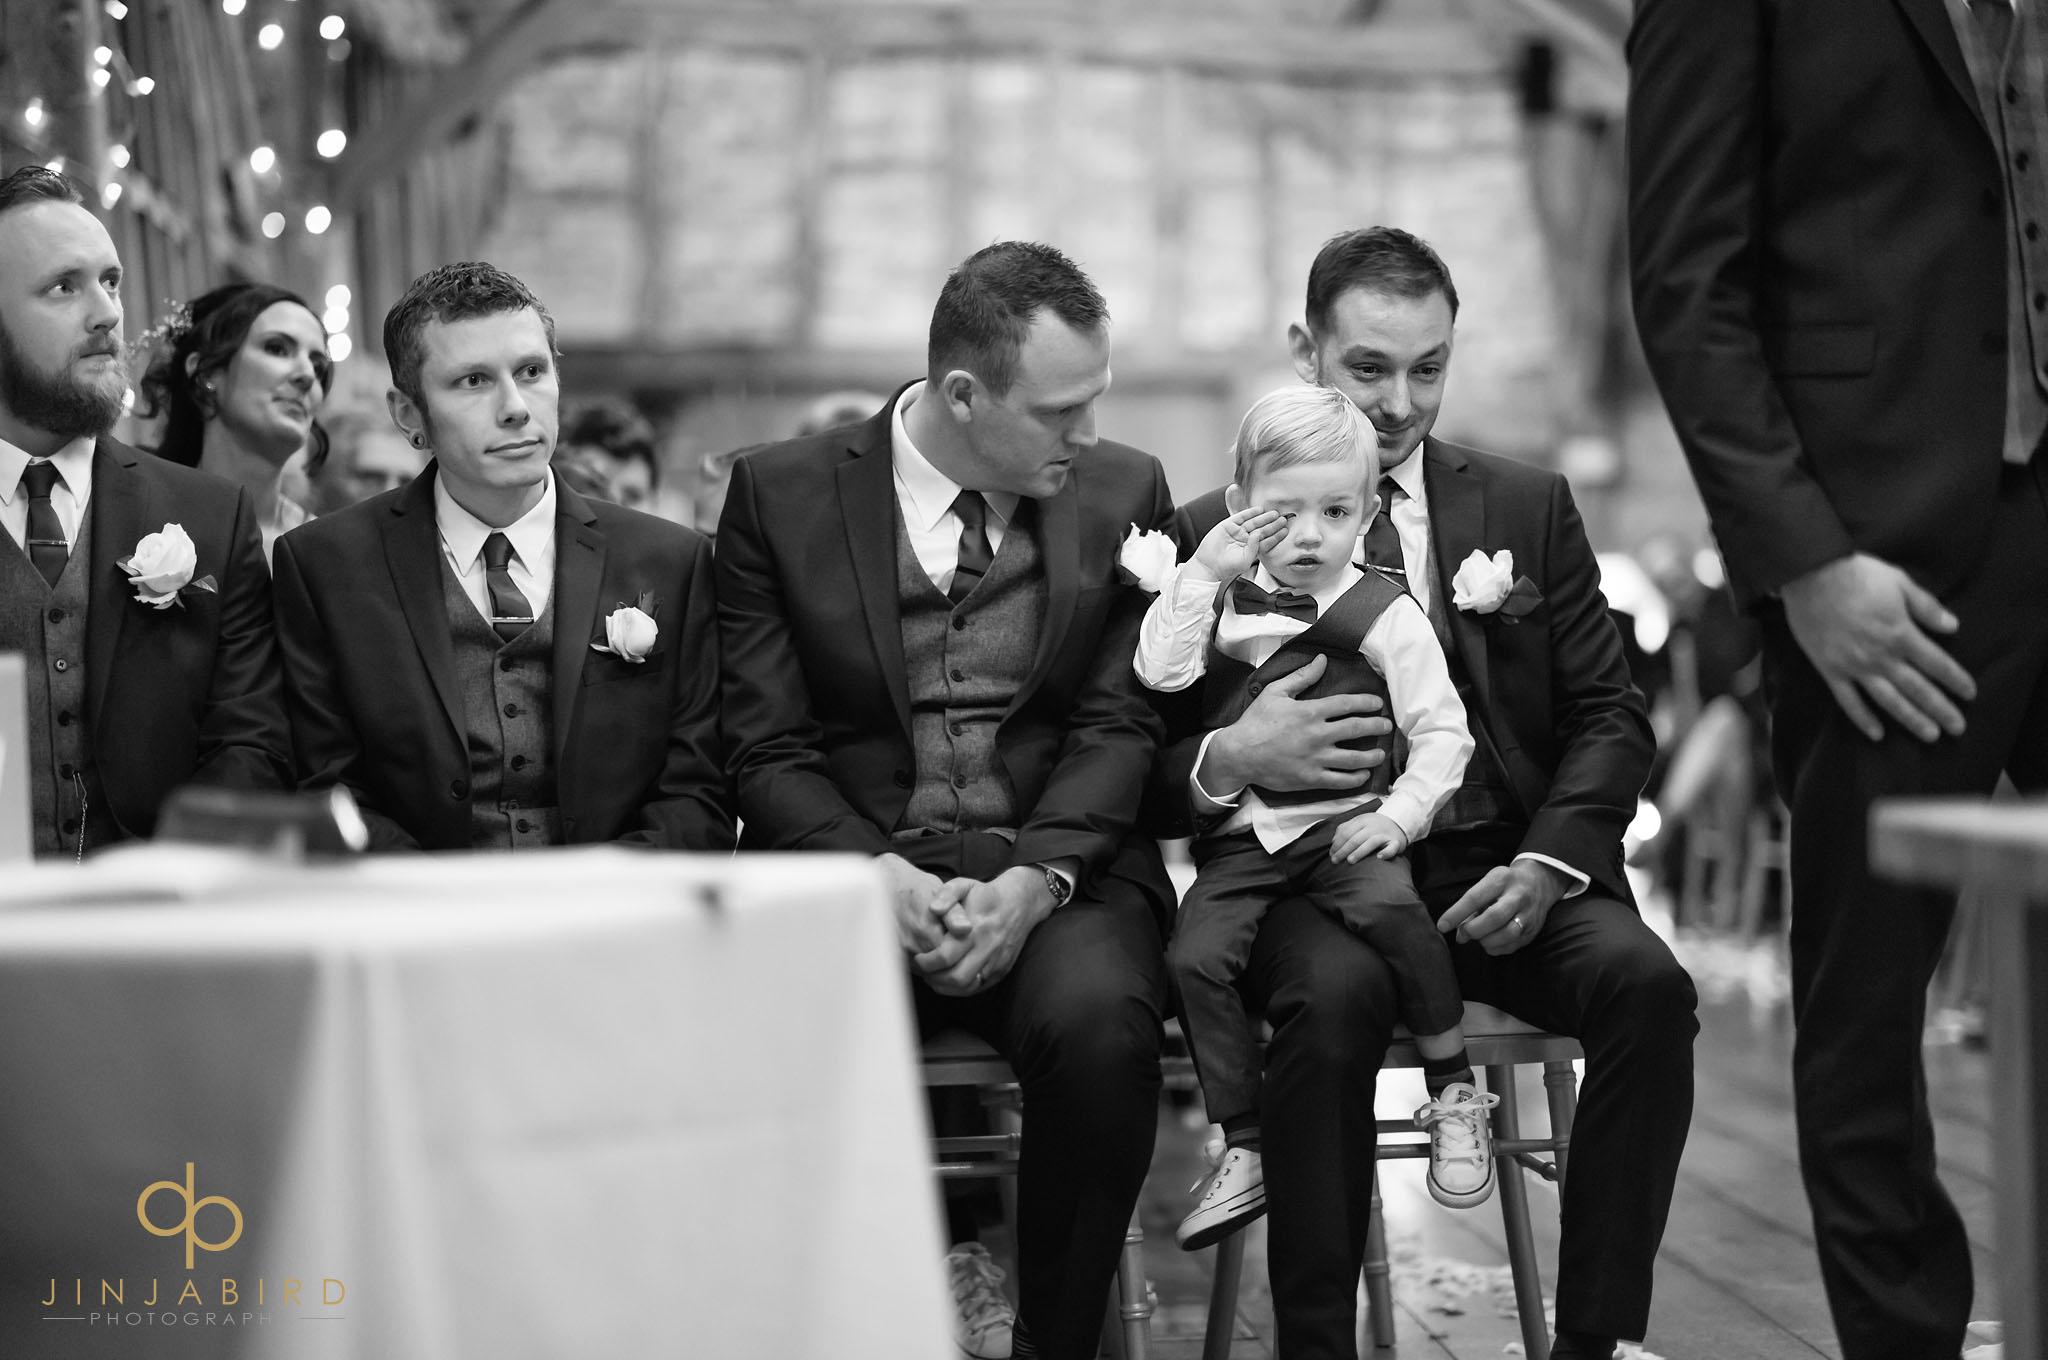 weddings at bassmead manor